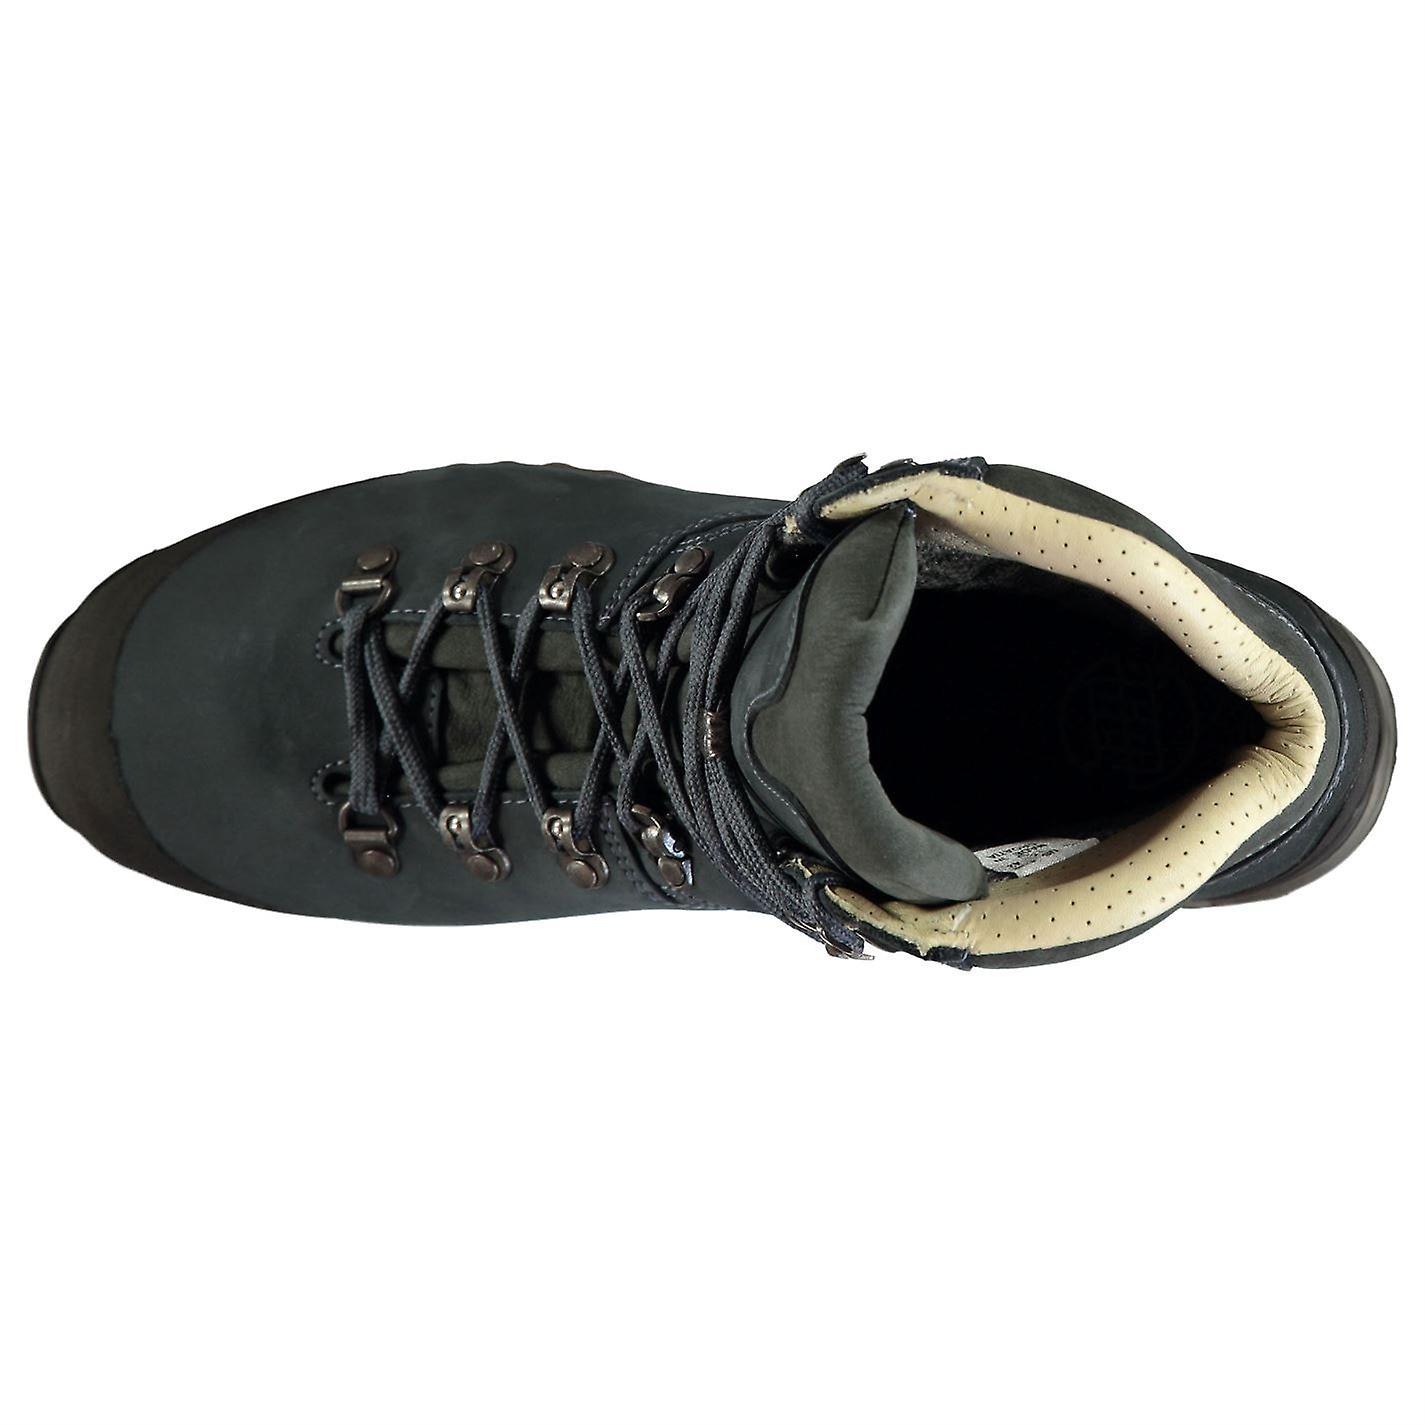 Hanwag Womens Tatra II GTX Ladies Walking Boots Shoes Sports GoreTex Full Lace Hiking